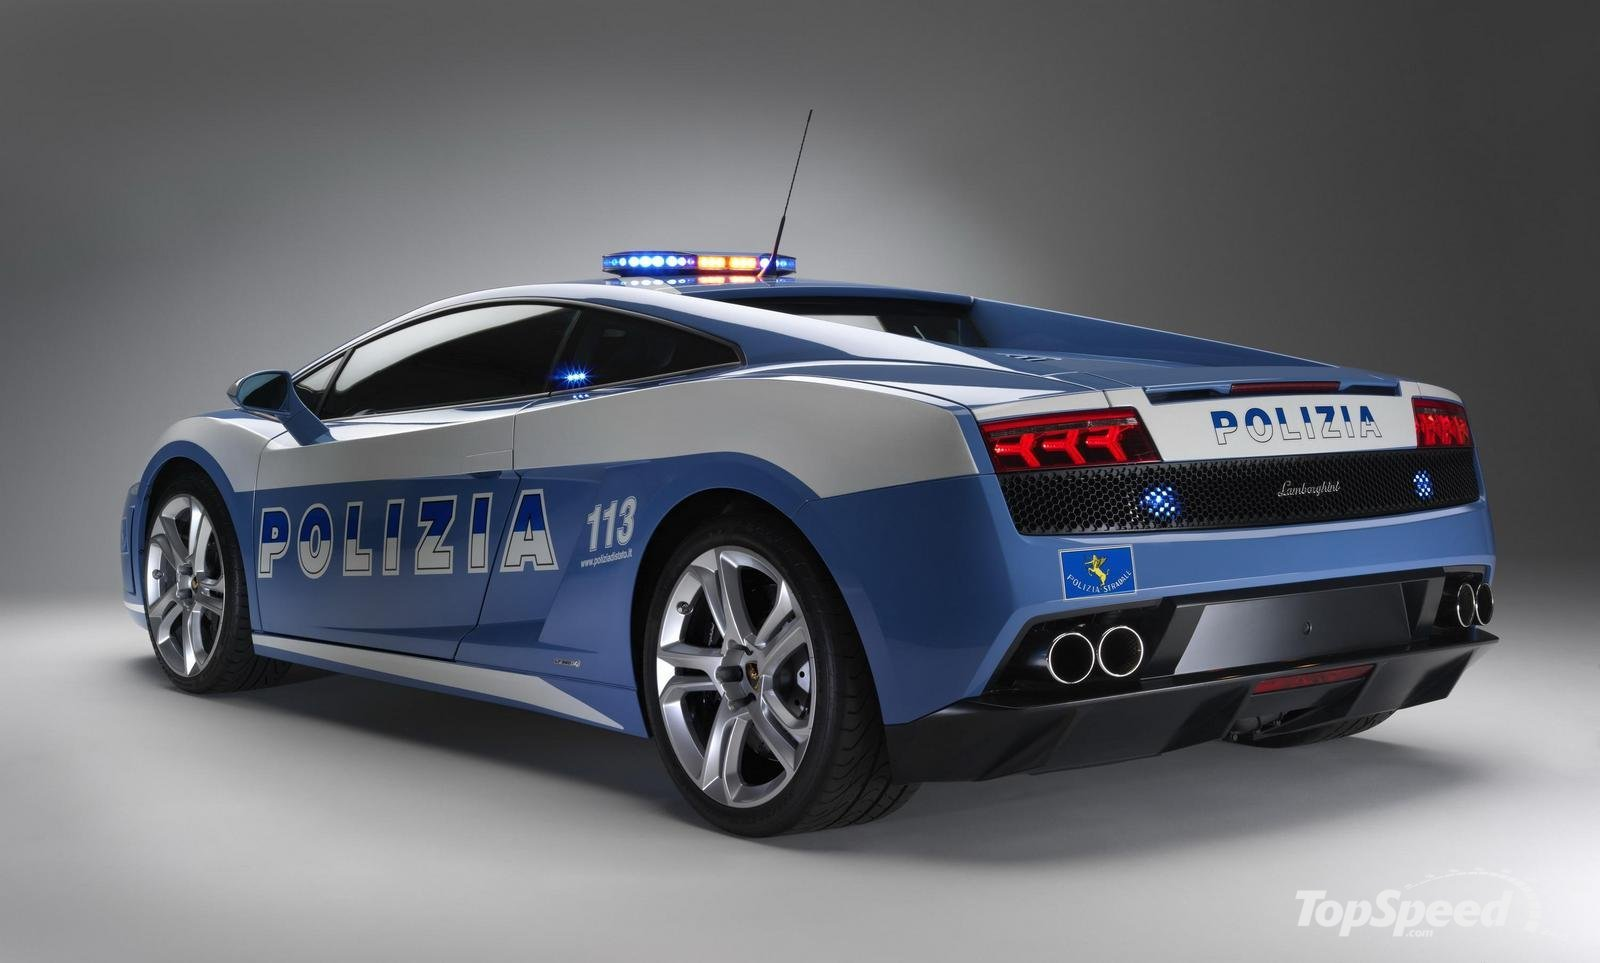 pakmasti lamborghini gallardo 2_1600x0w - Lamborghini Egoista Police